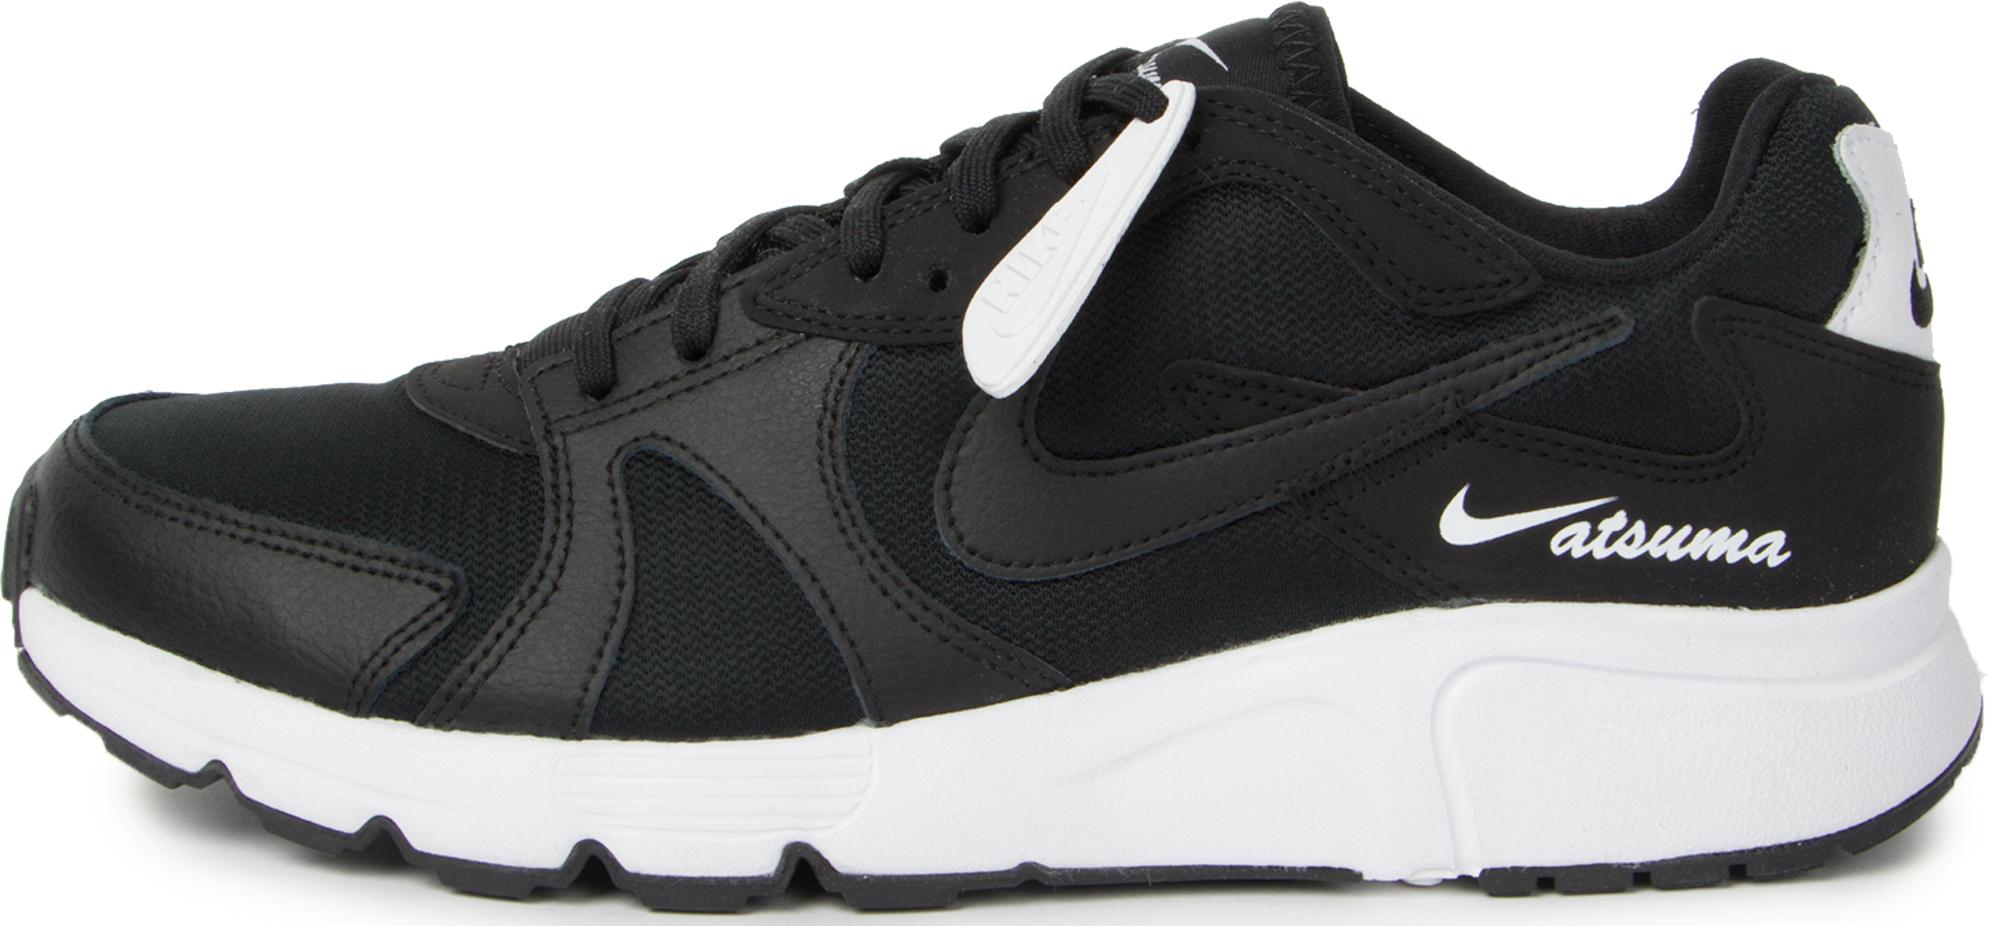 Nike Кроссовки женские Nike Atsuma, размер 35.5